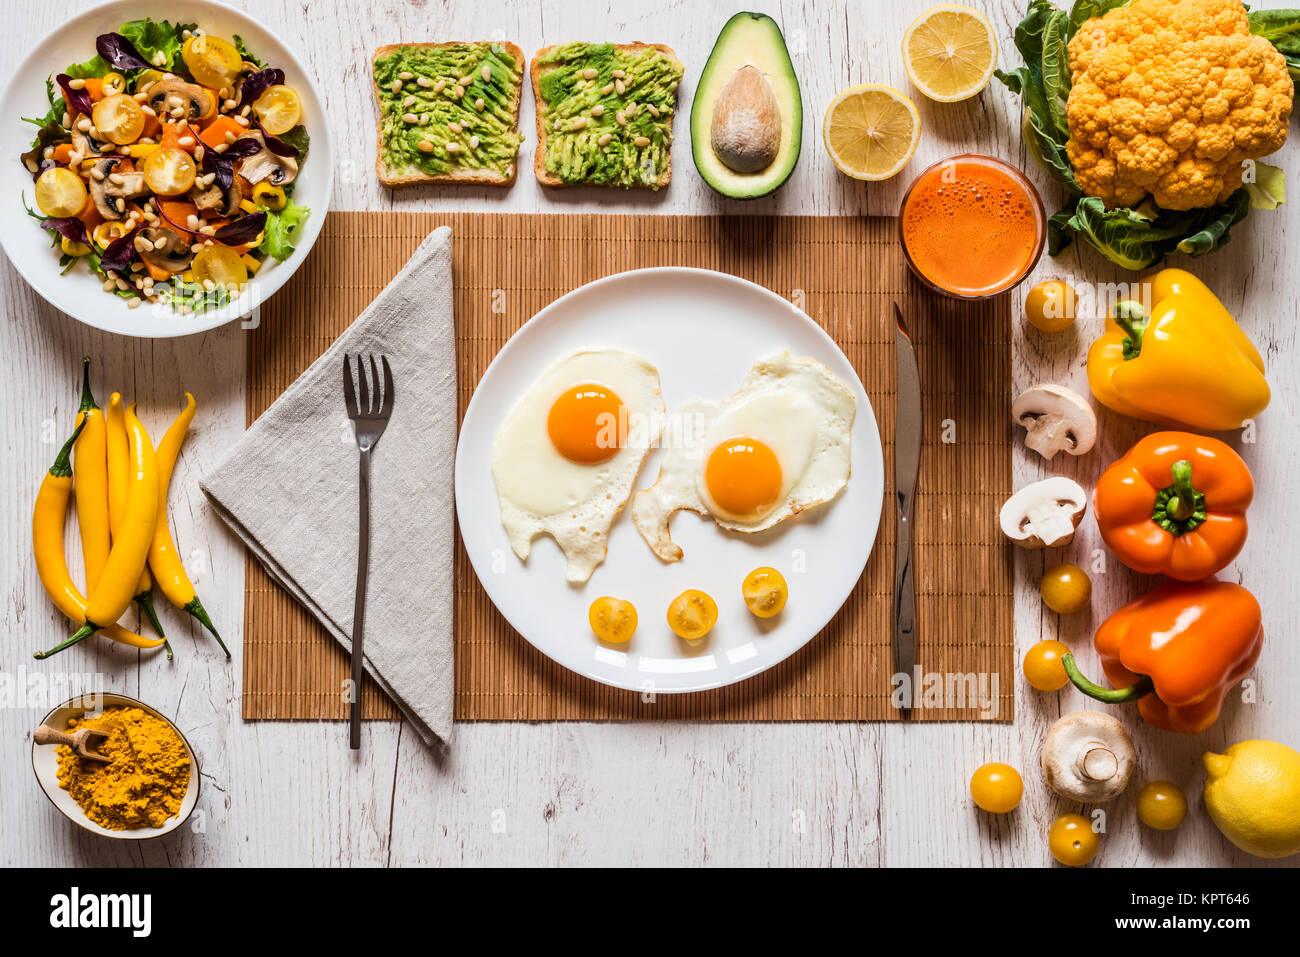 Healthy Food For Breakfast Fried Eggs Vegan Avocado Sandwiches